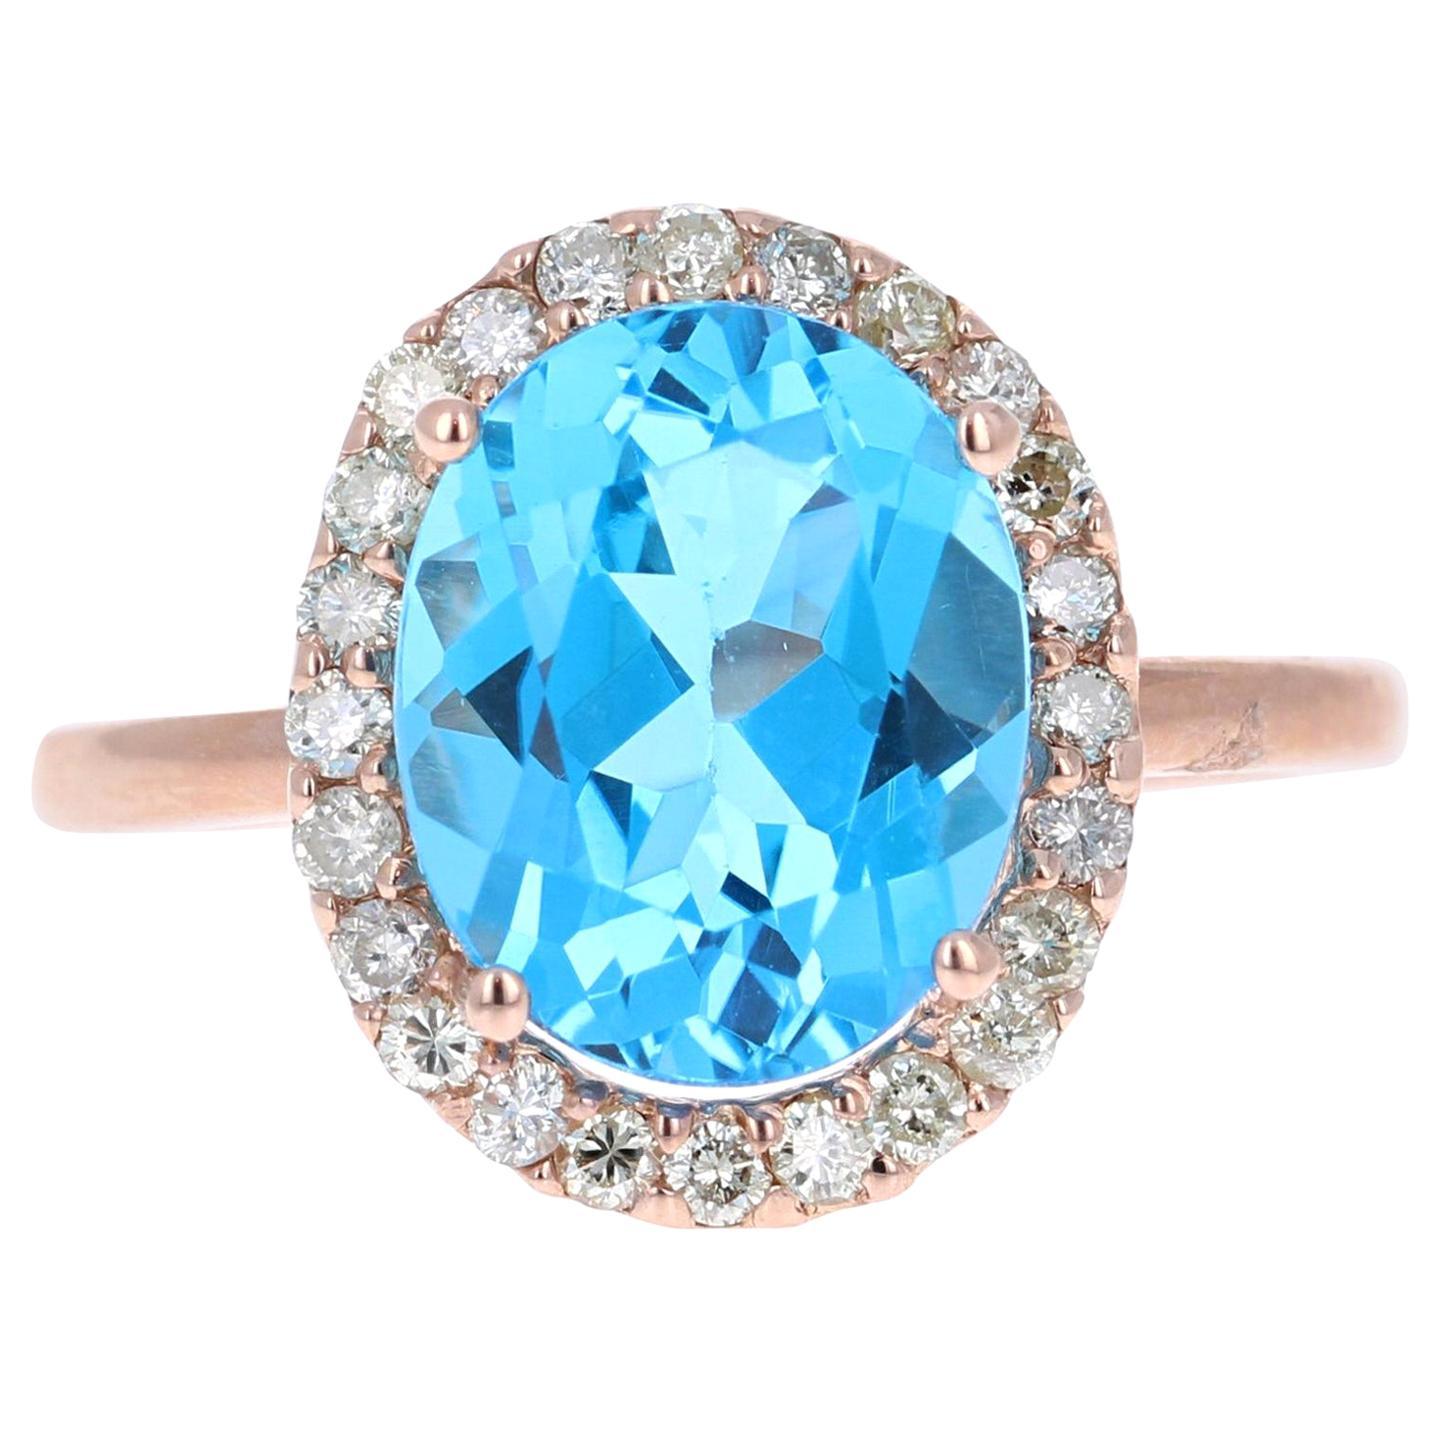 4.63 Carat Blue Topaz Diamond Rose Gold Cocktail Ring